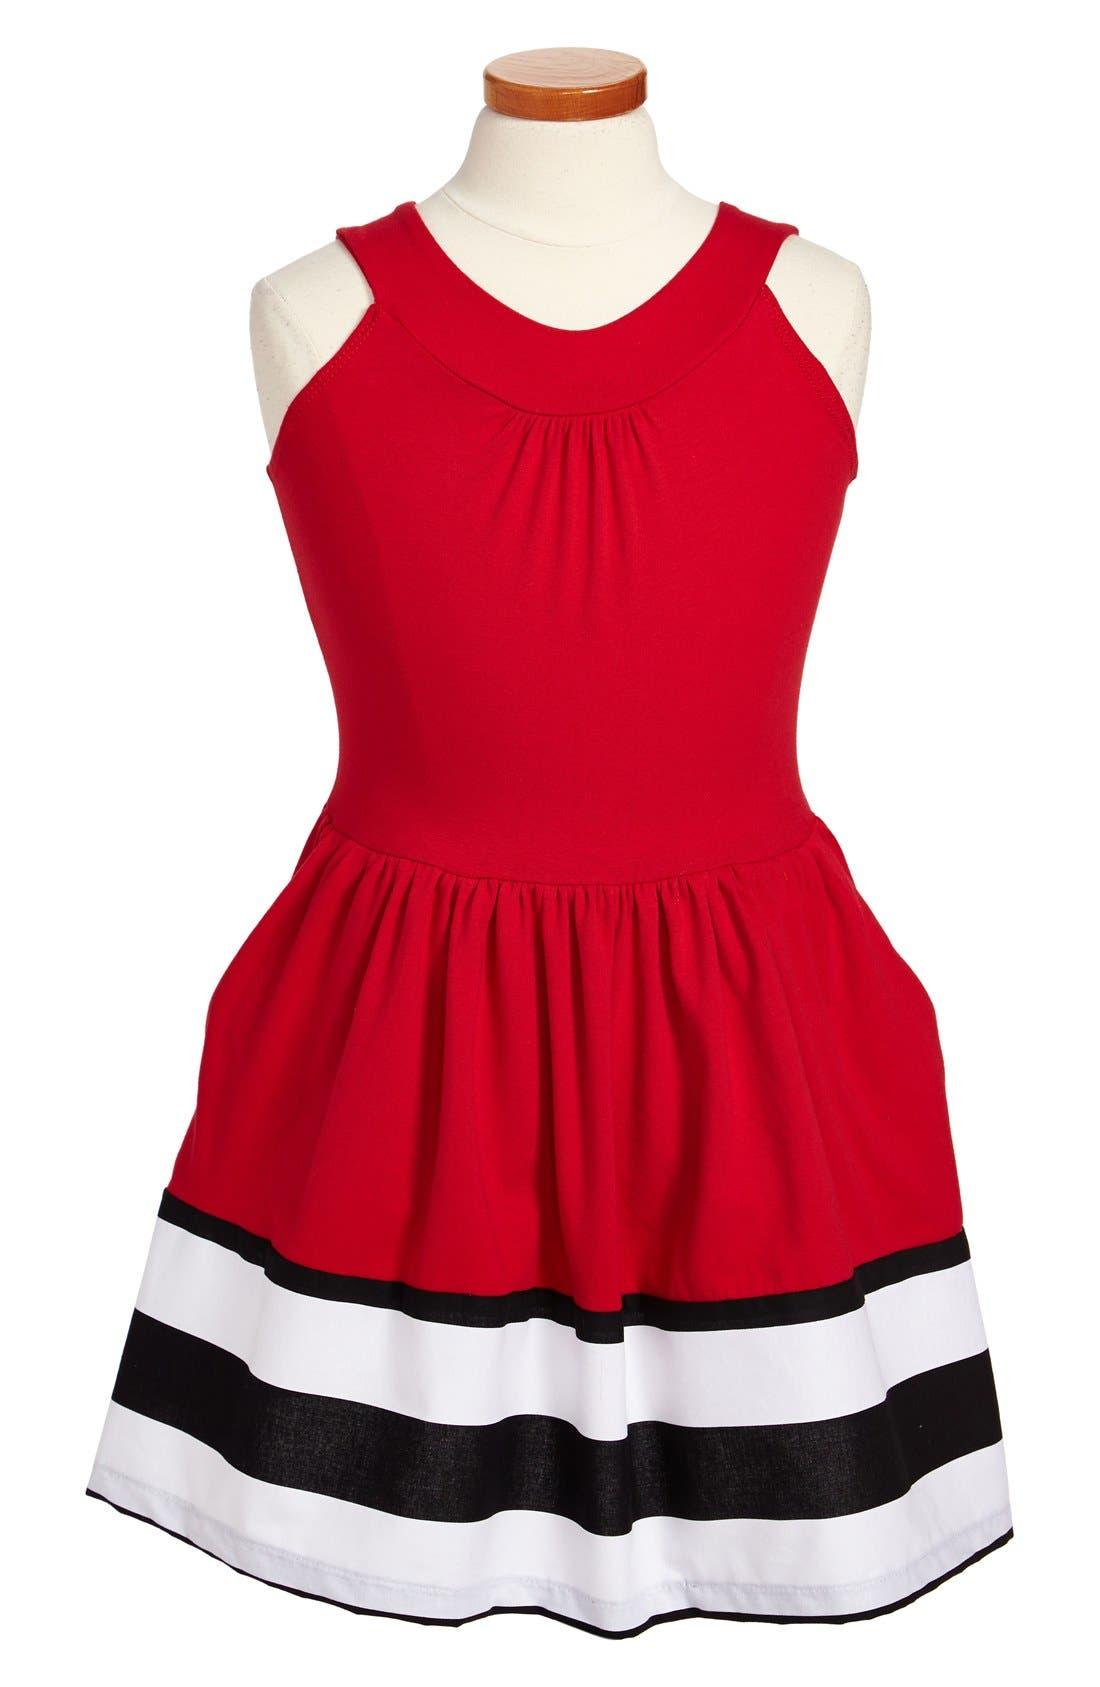 Main Image - Fiveloaves Twofish 'Unexpected' Dress (Little Girls & Big Girls)